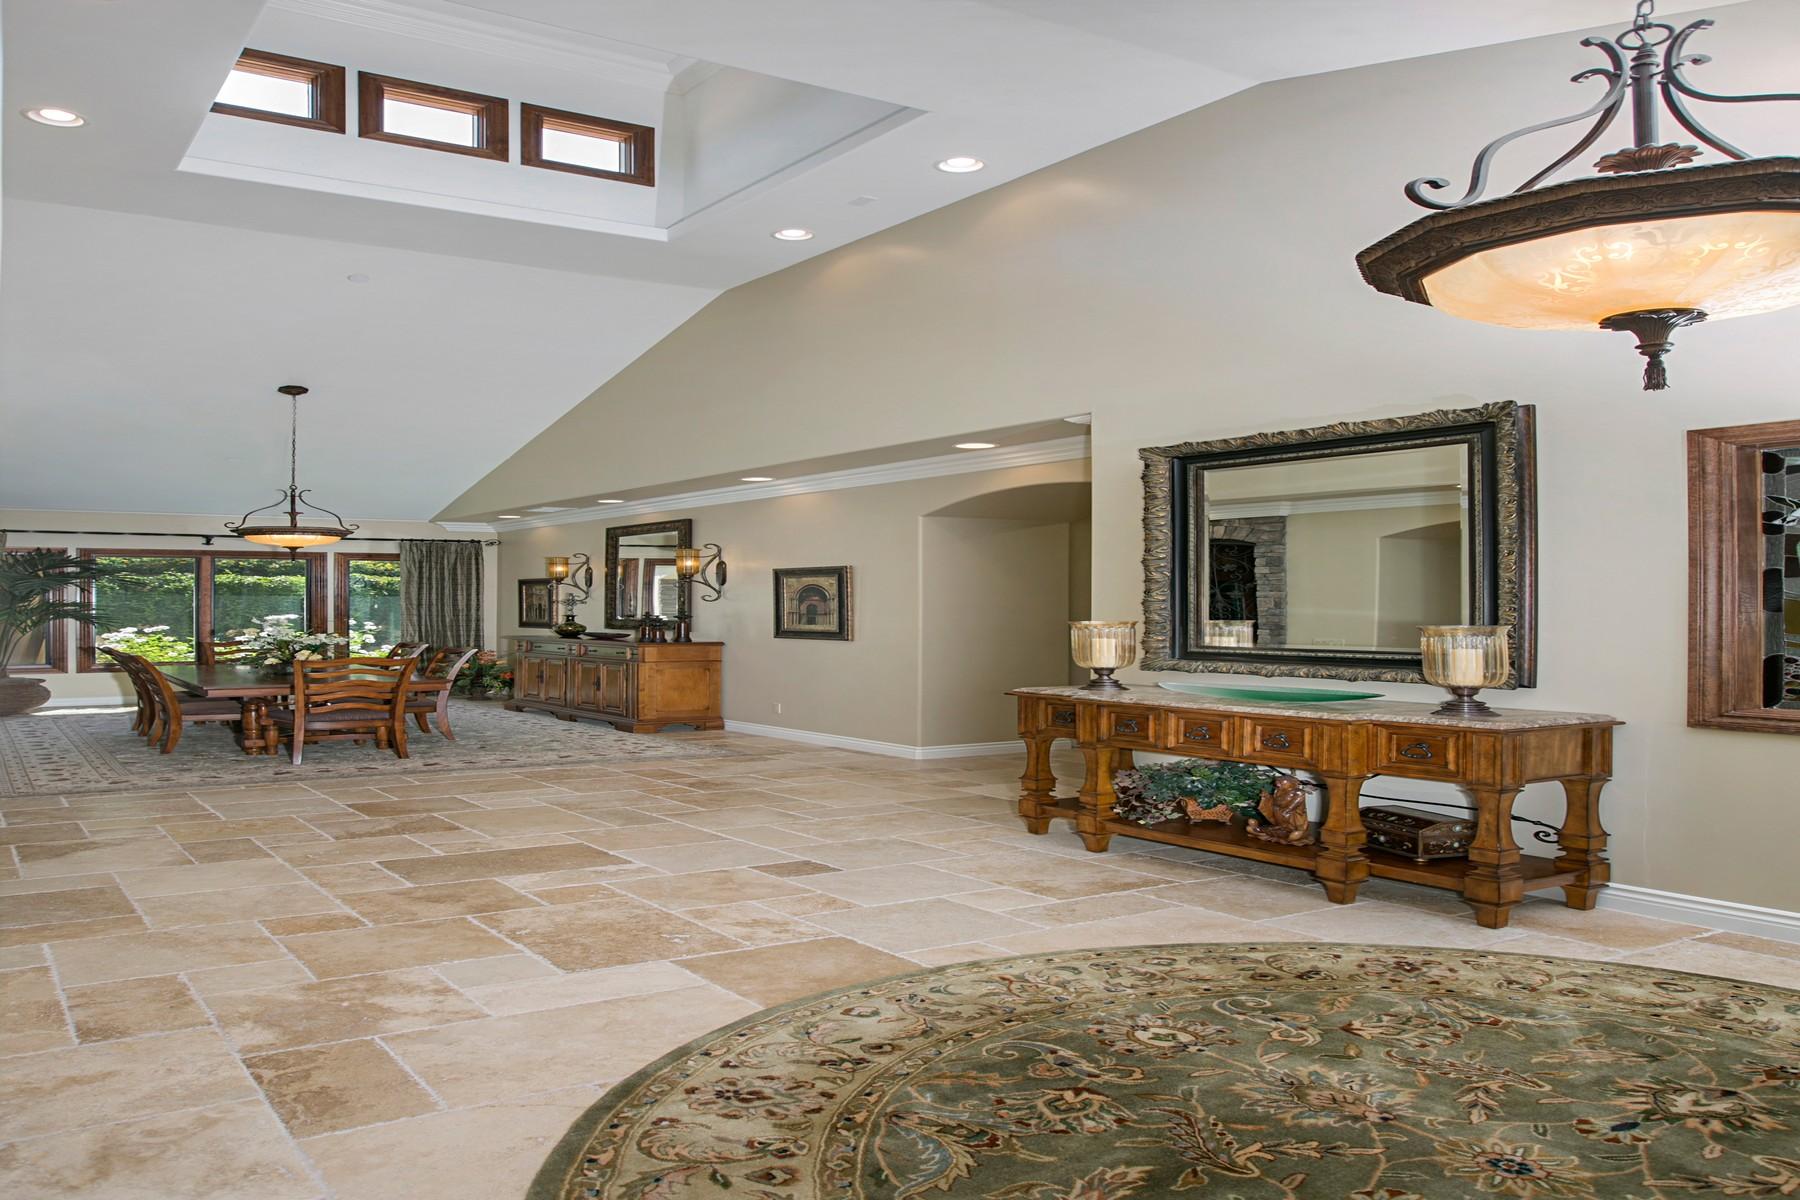 Additional photo for property listing at 17206 El Caporal  Rancho Santa Fe, 加利福尼亚州 92067 美国